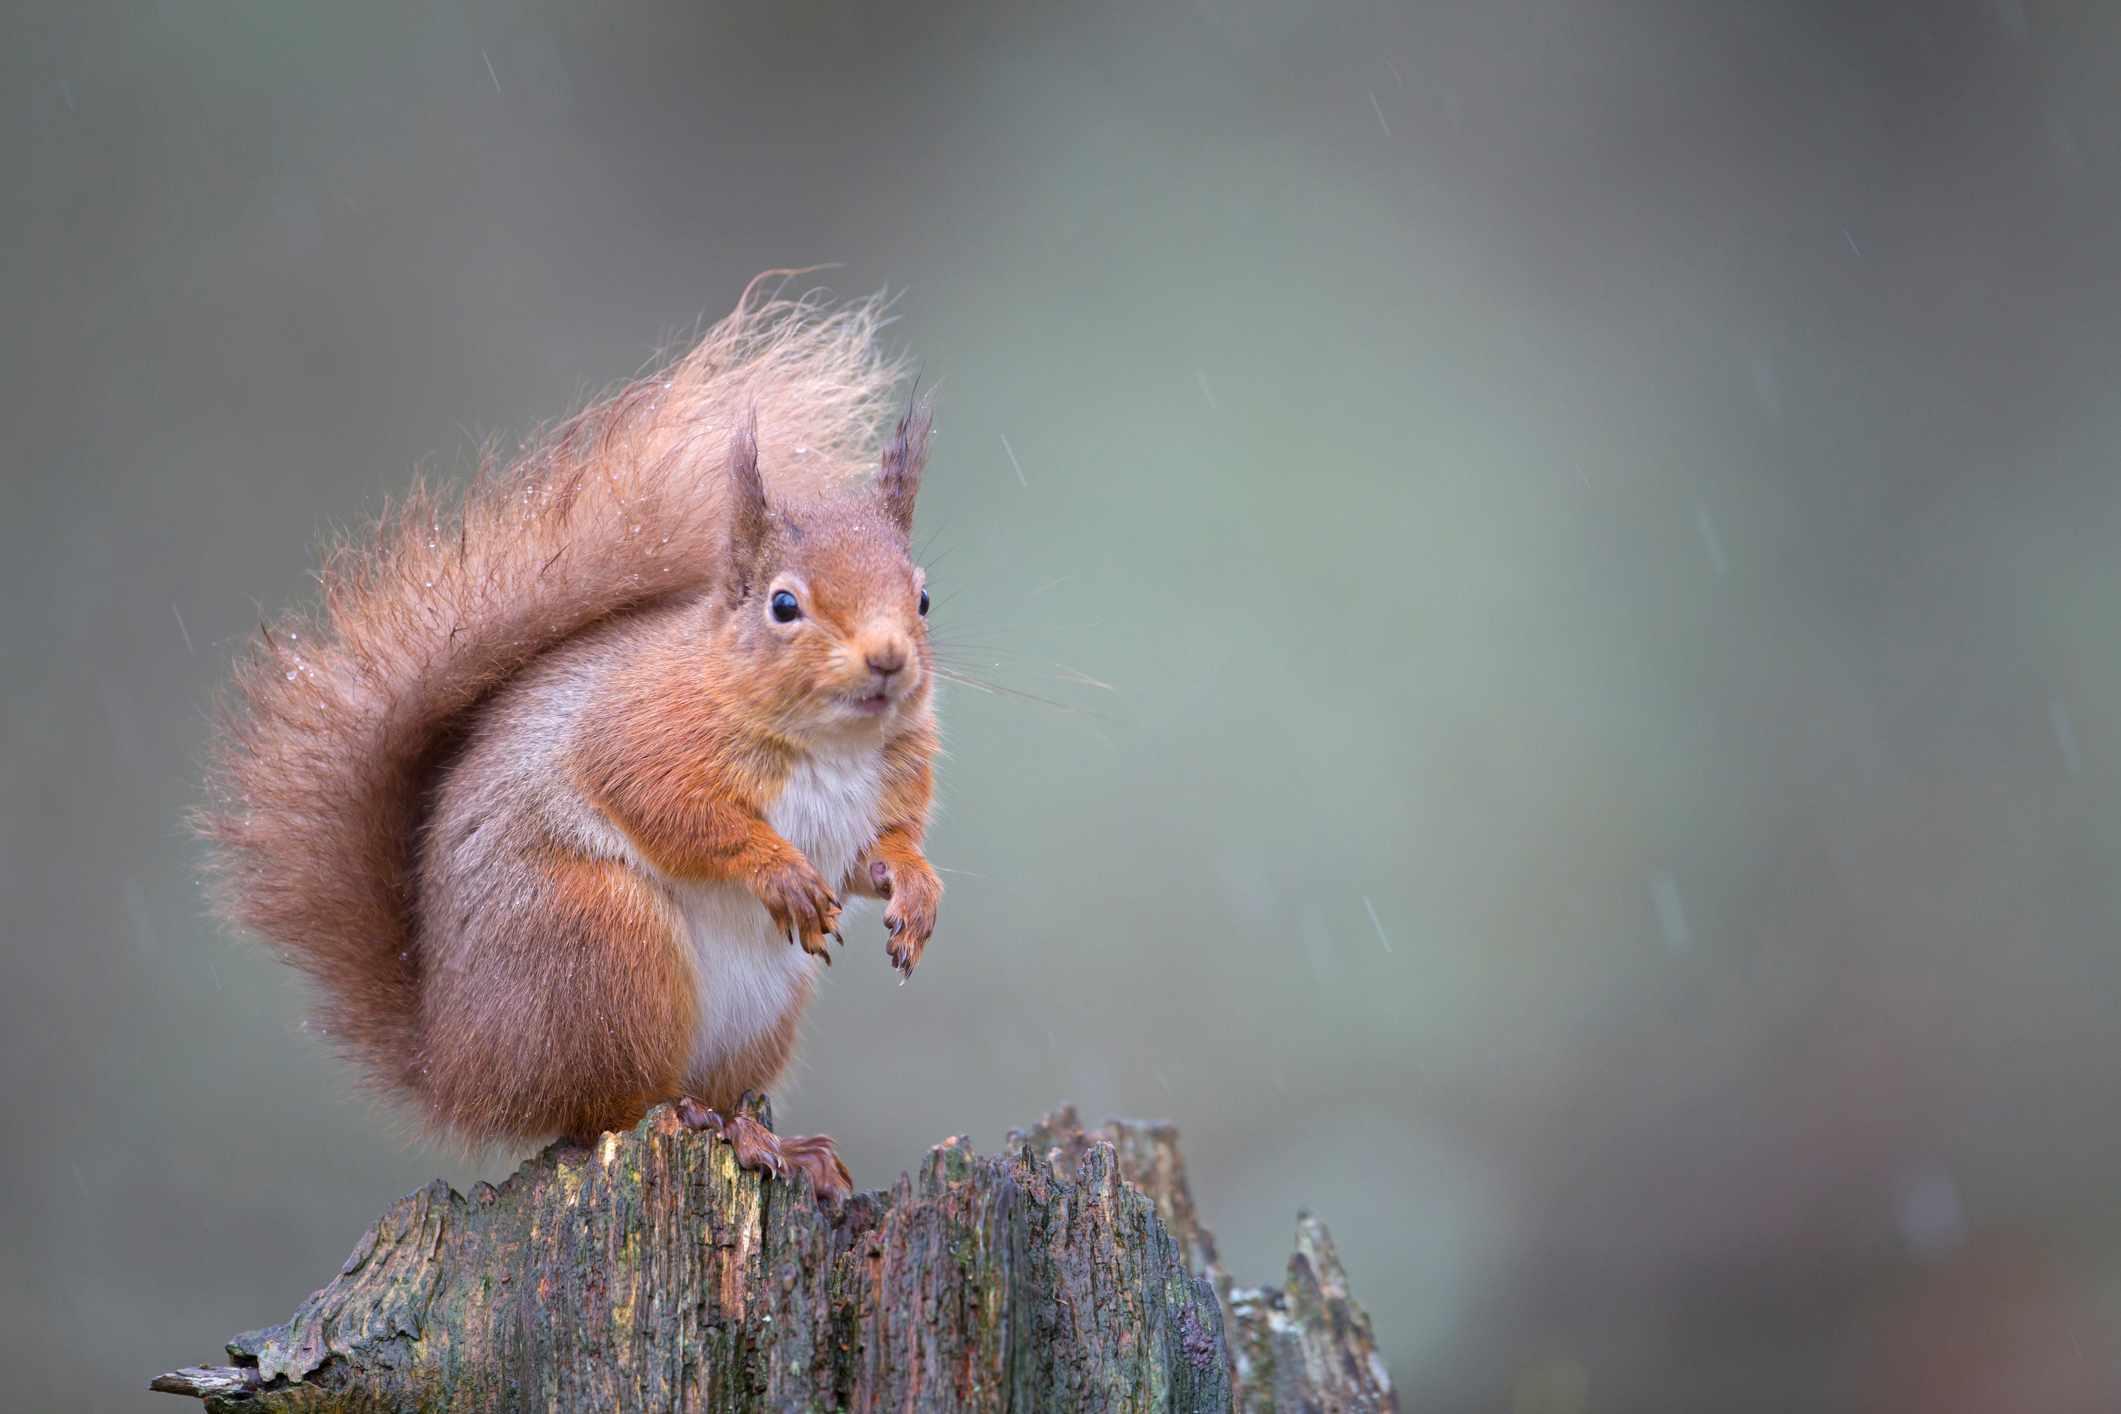 Red squirrel Sciurus vulgaris, sitting in forest, Cairngorms National Park, Scotland, February